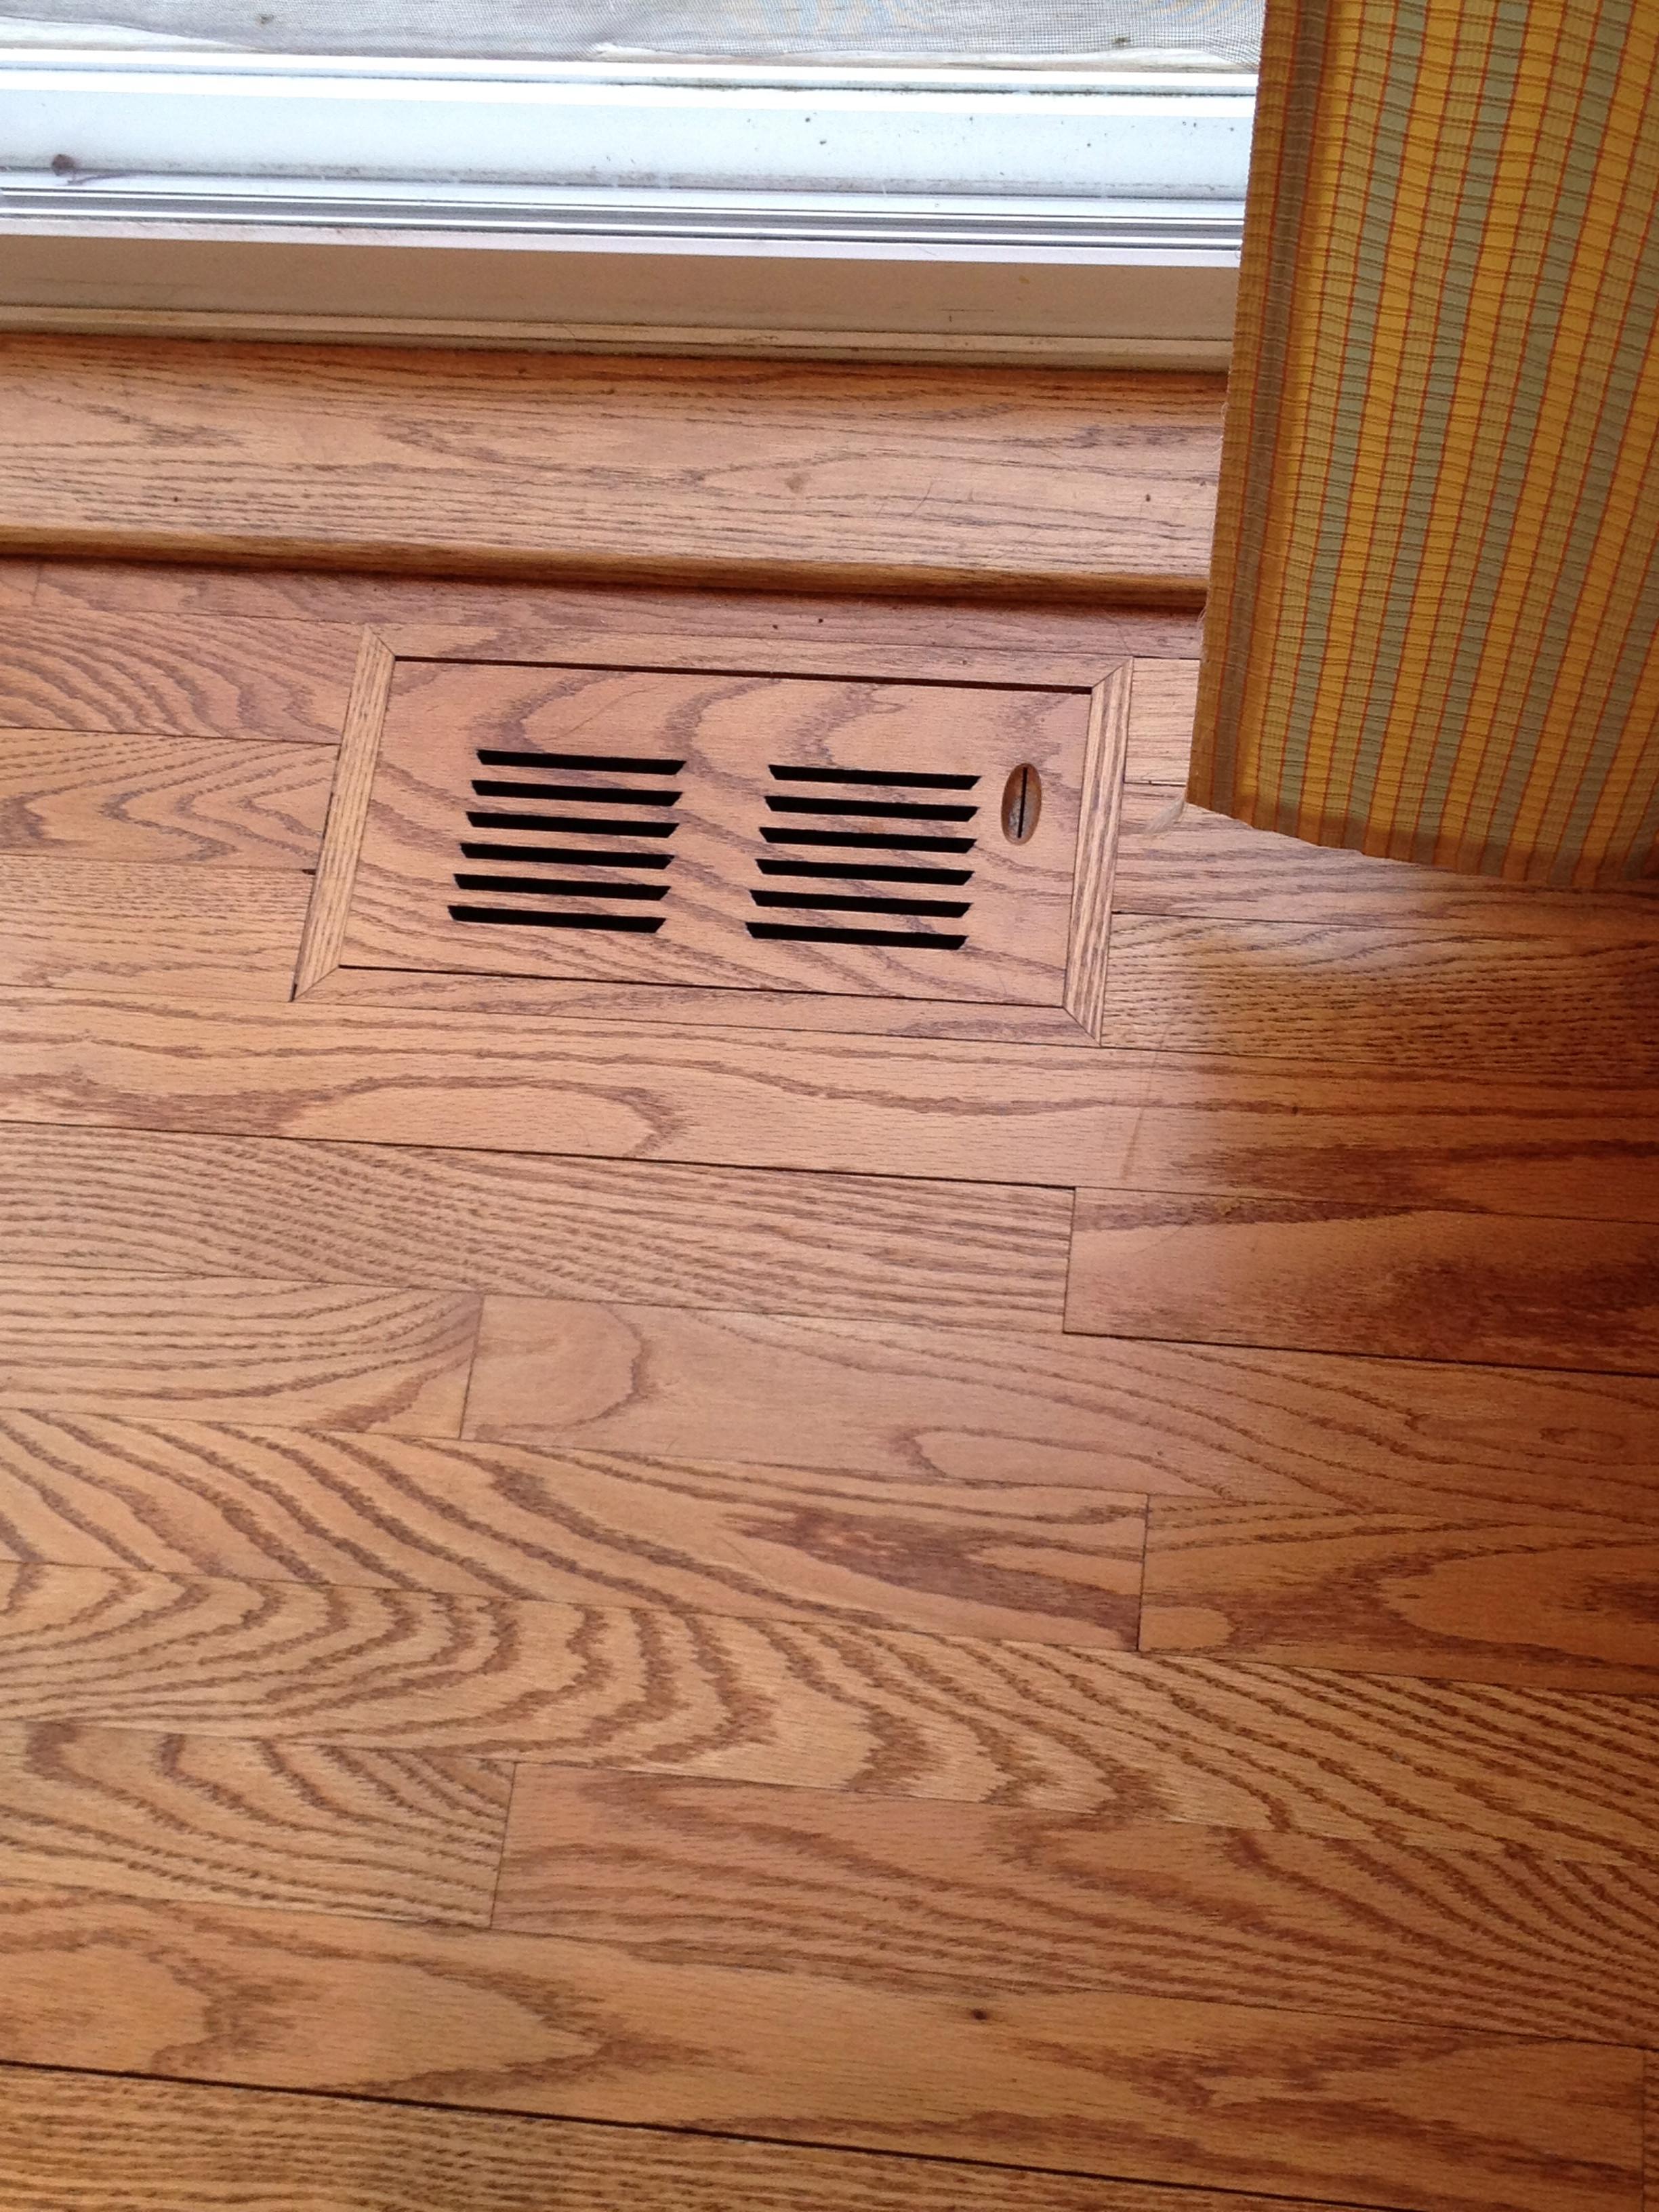 Hardwood Floor Refinishing Mercer County Nj Of Flooring Portfolio Gorsegner Brothers Pertaining to Img 0222